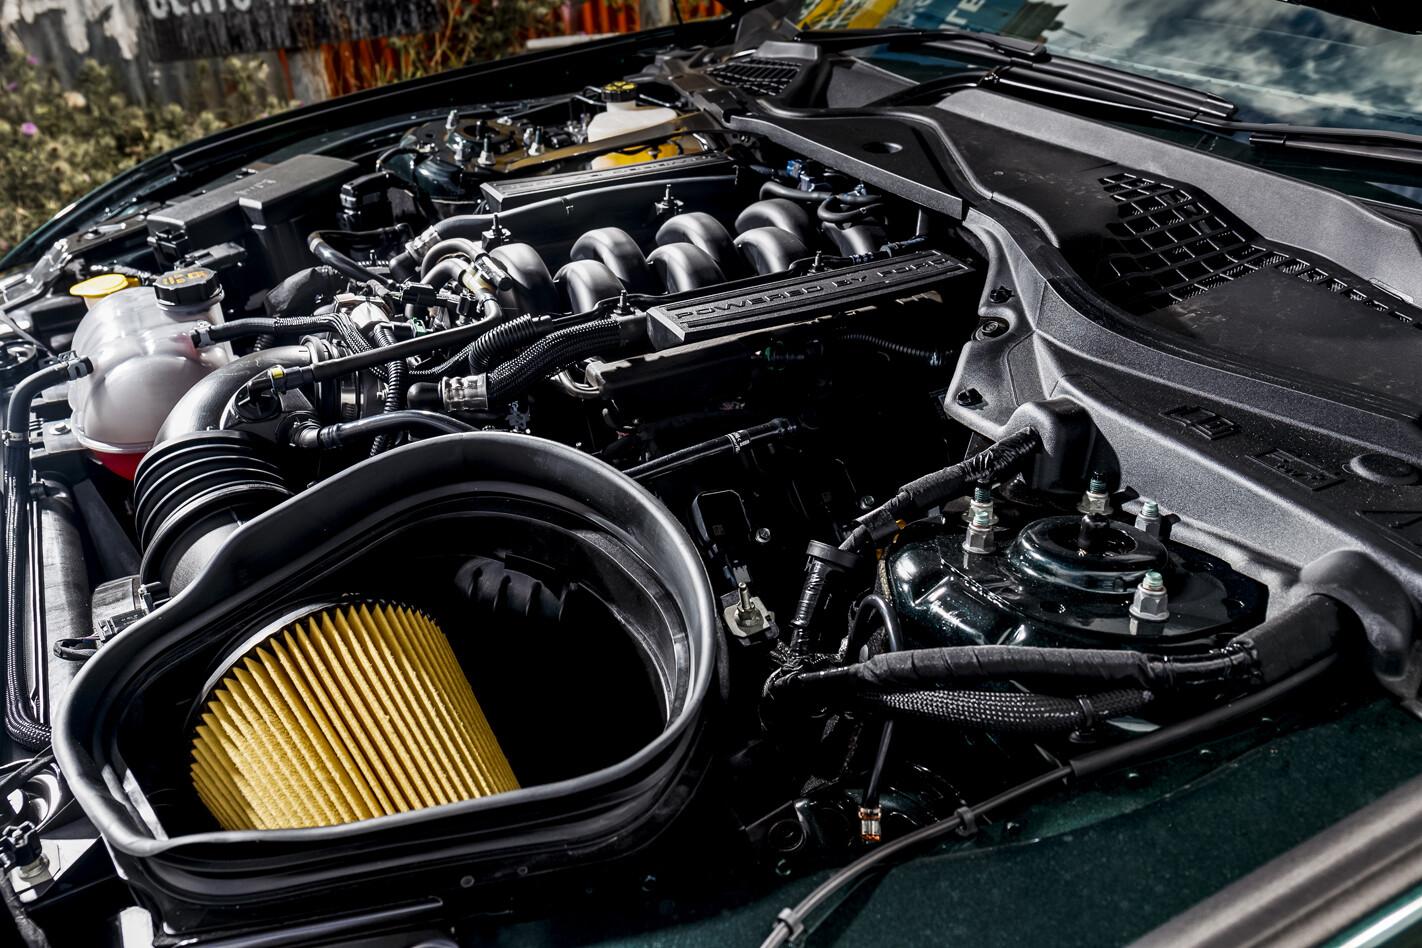 Bullitt Mustang motor